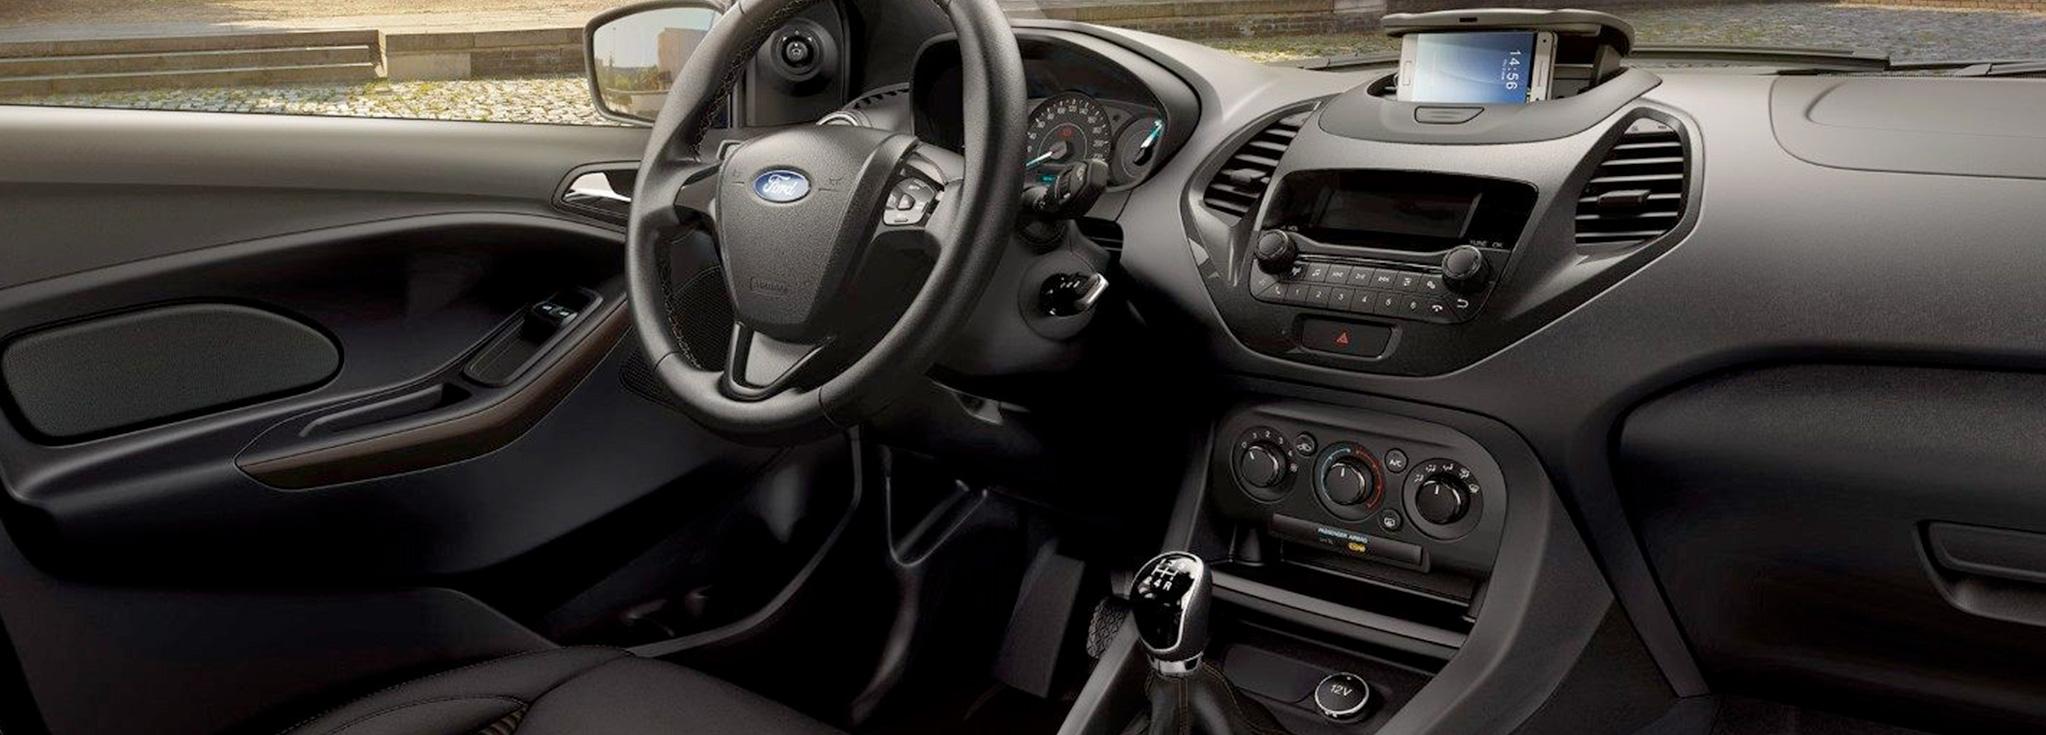 Interior del ford ka+